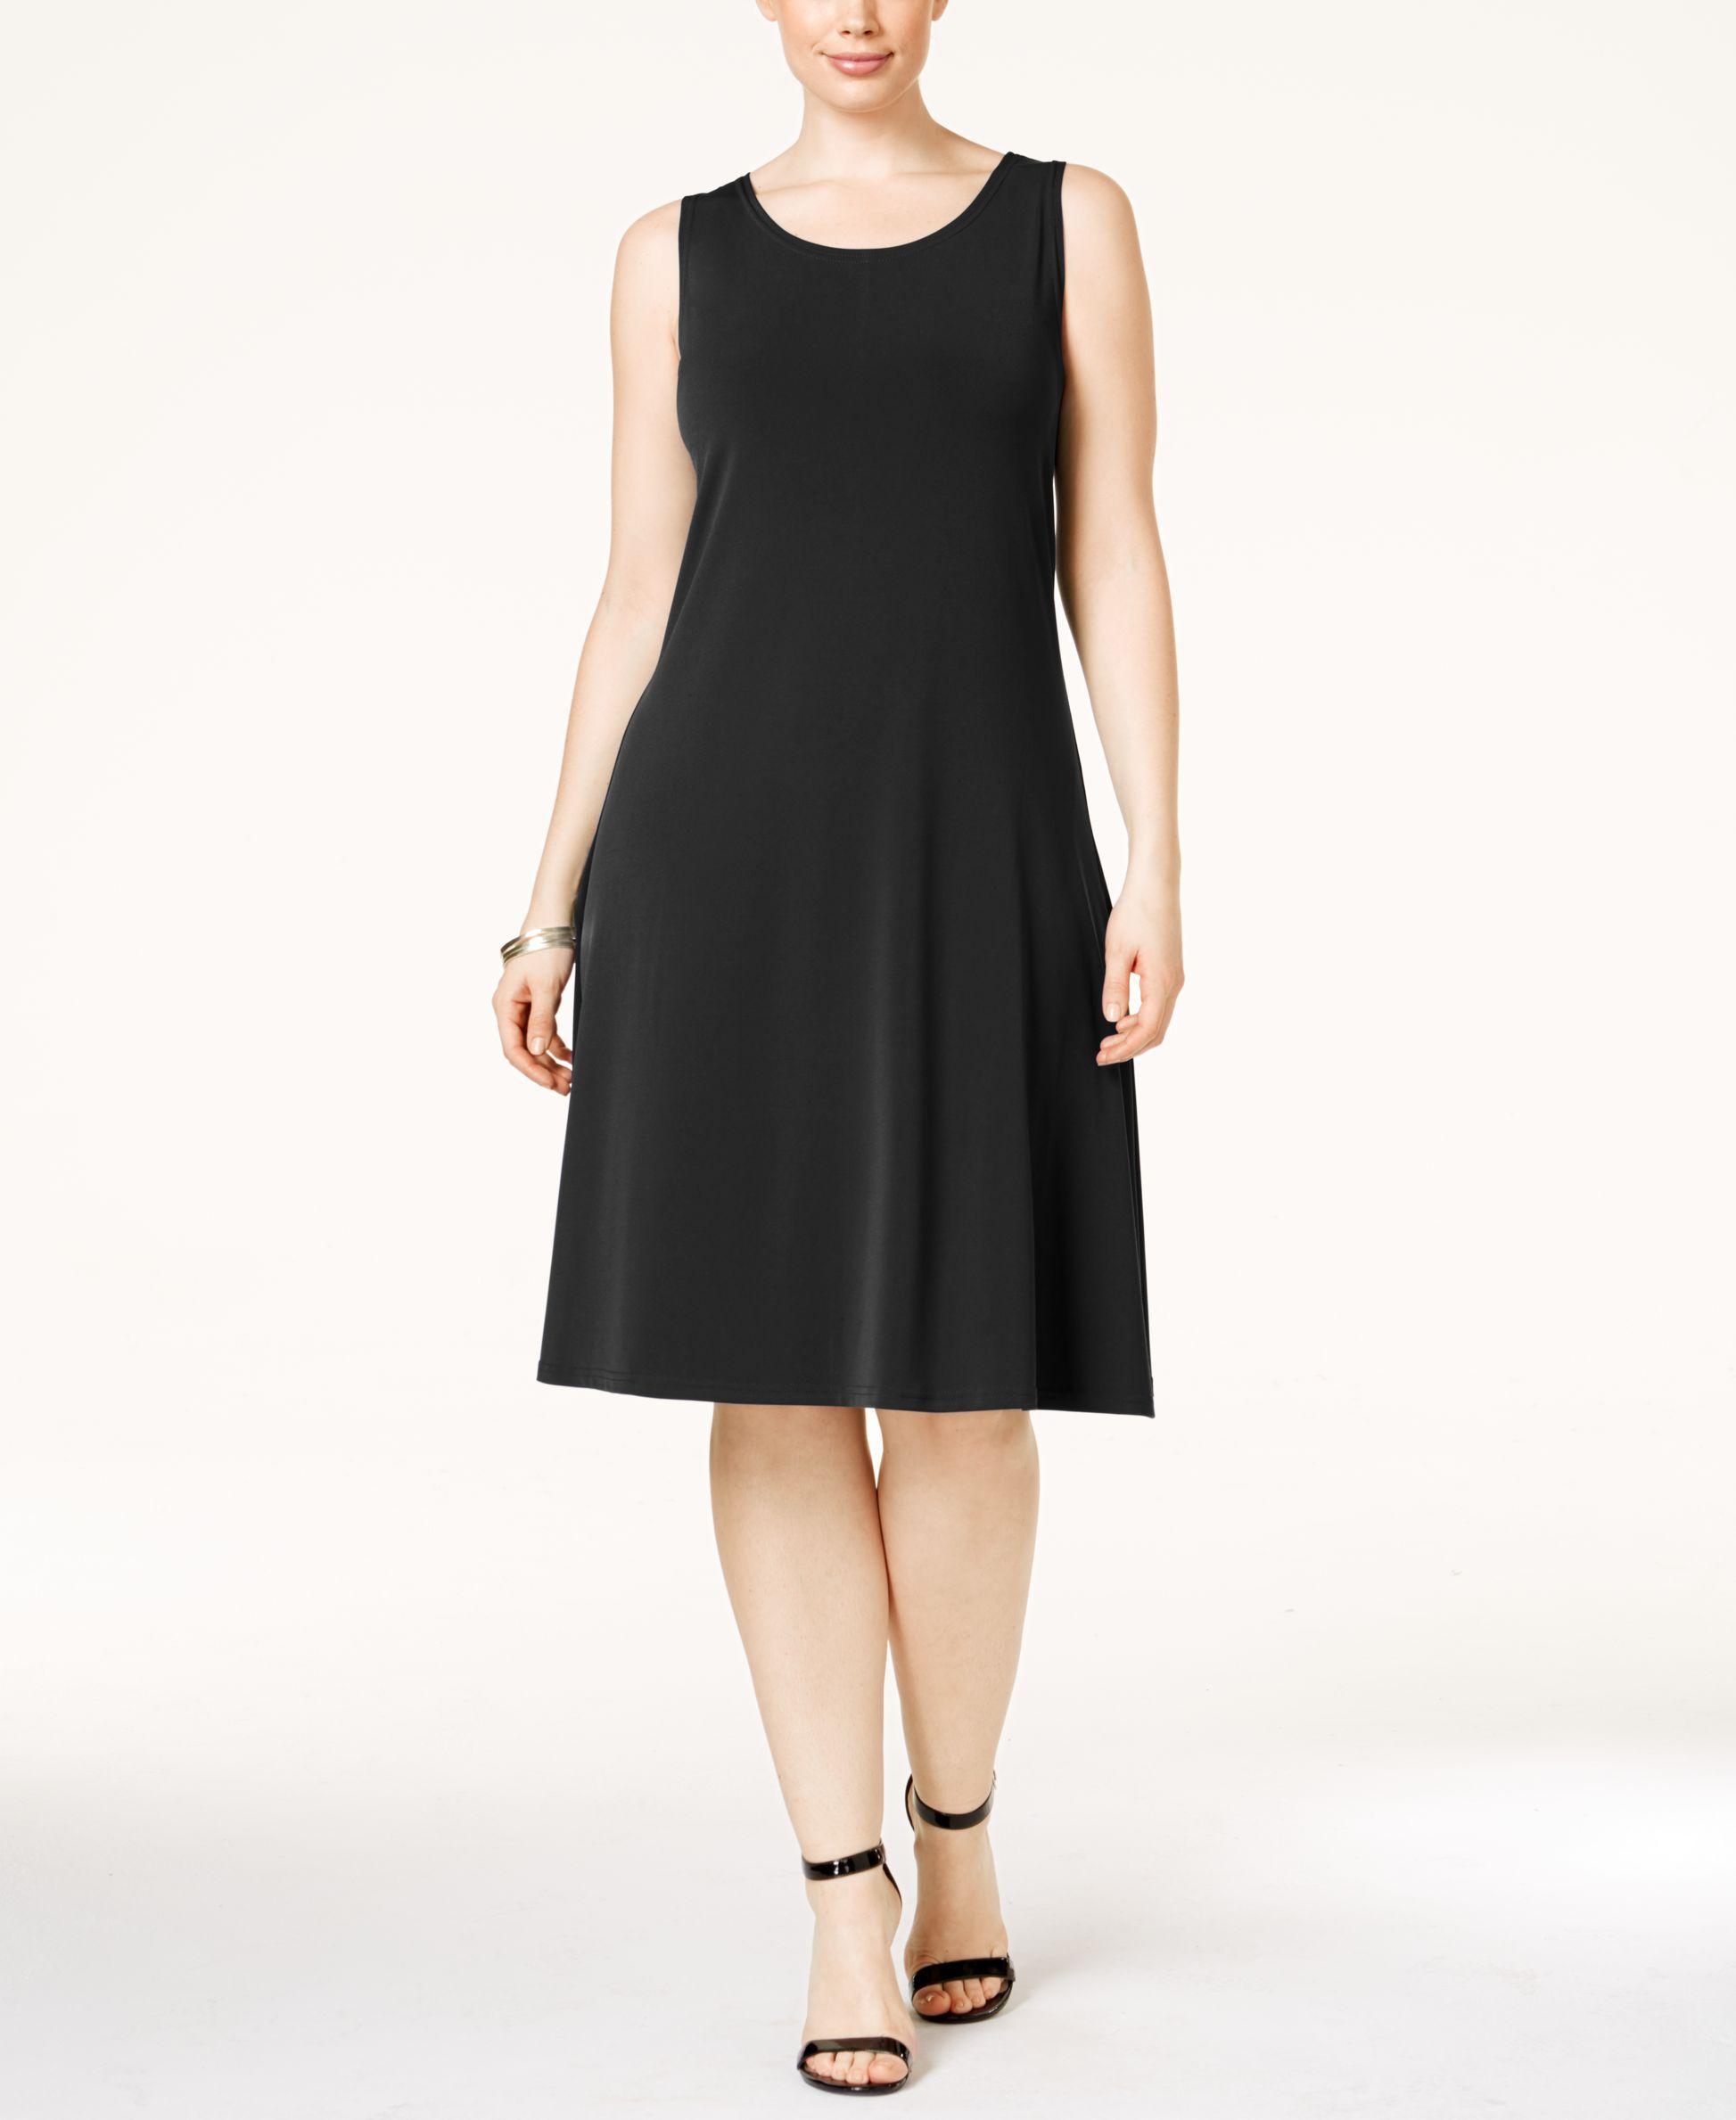 Alfani Plus Size Sleeveless A Line Dress ly at Macy s